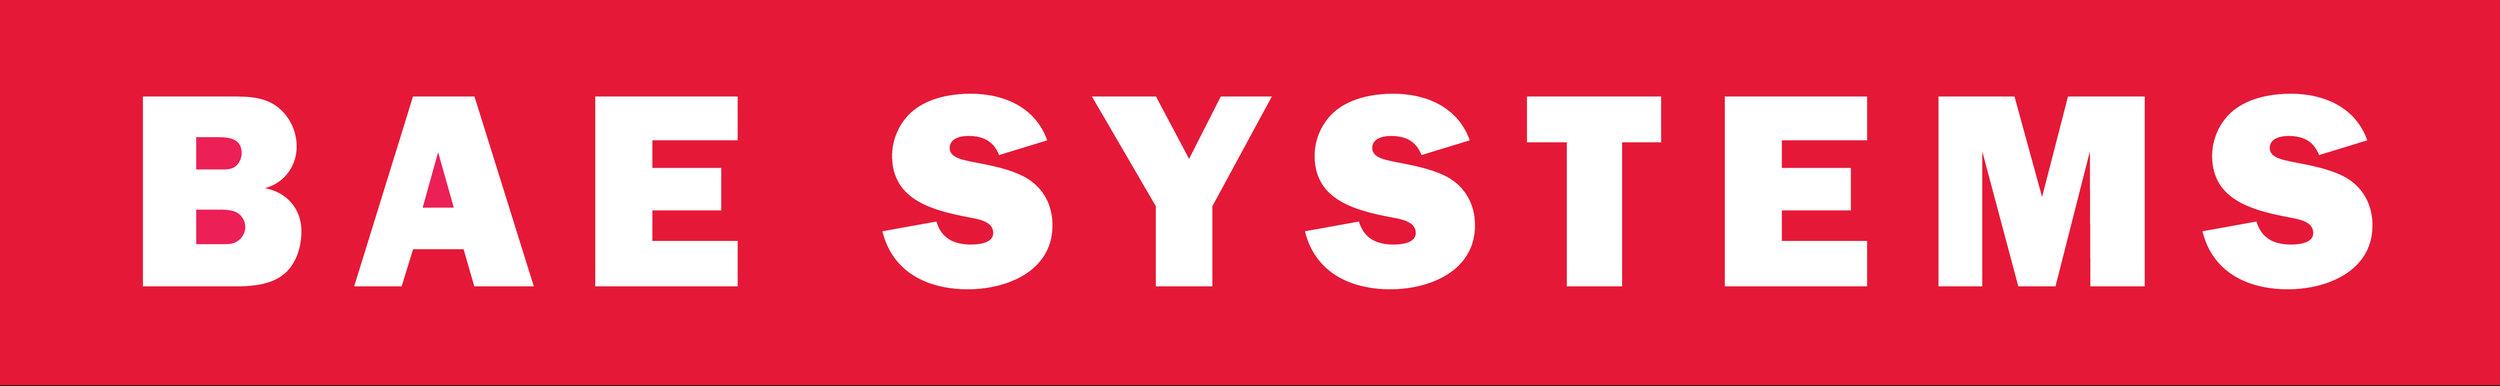 BAE-Systems-logo.jpg